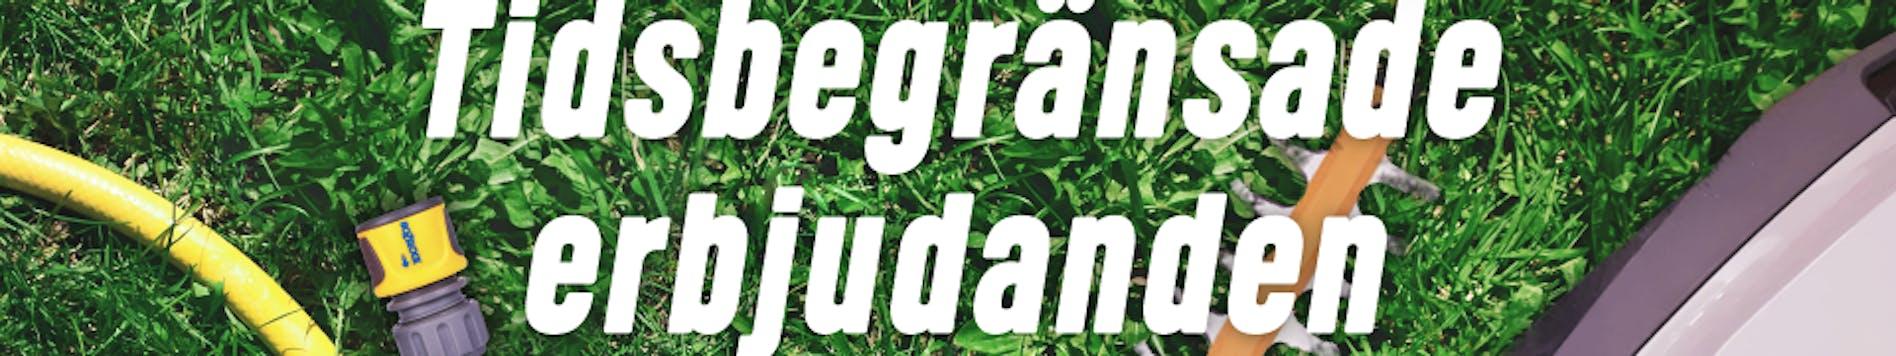 https://www.proffsmagasinet.se/tradgard-kampanj